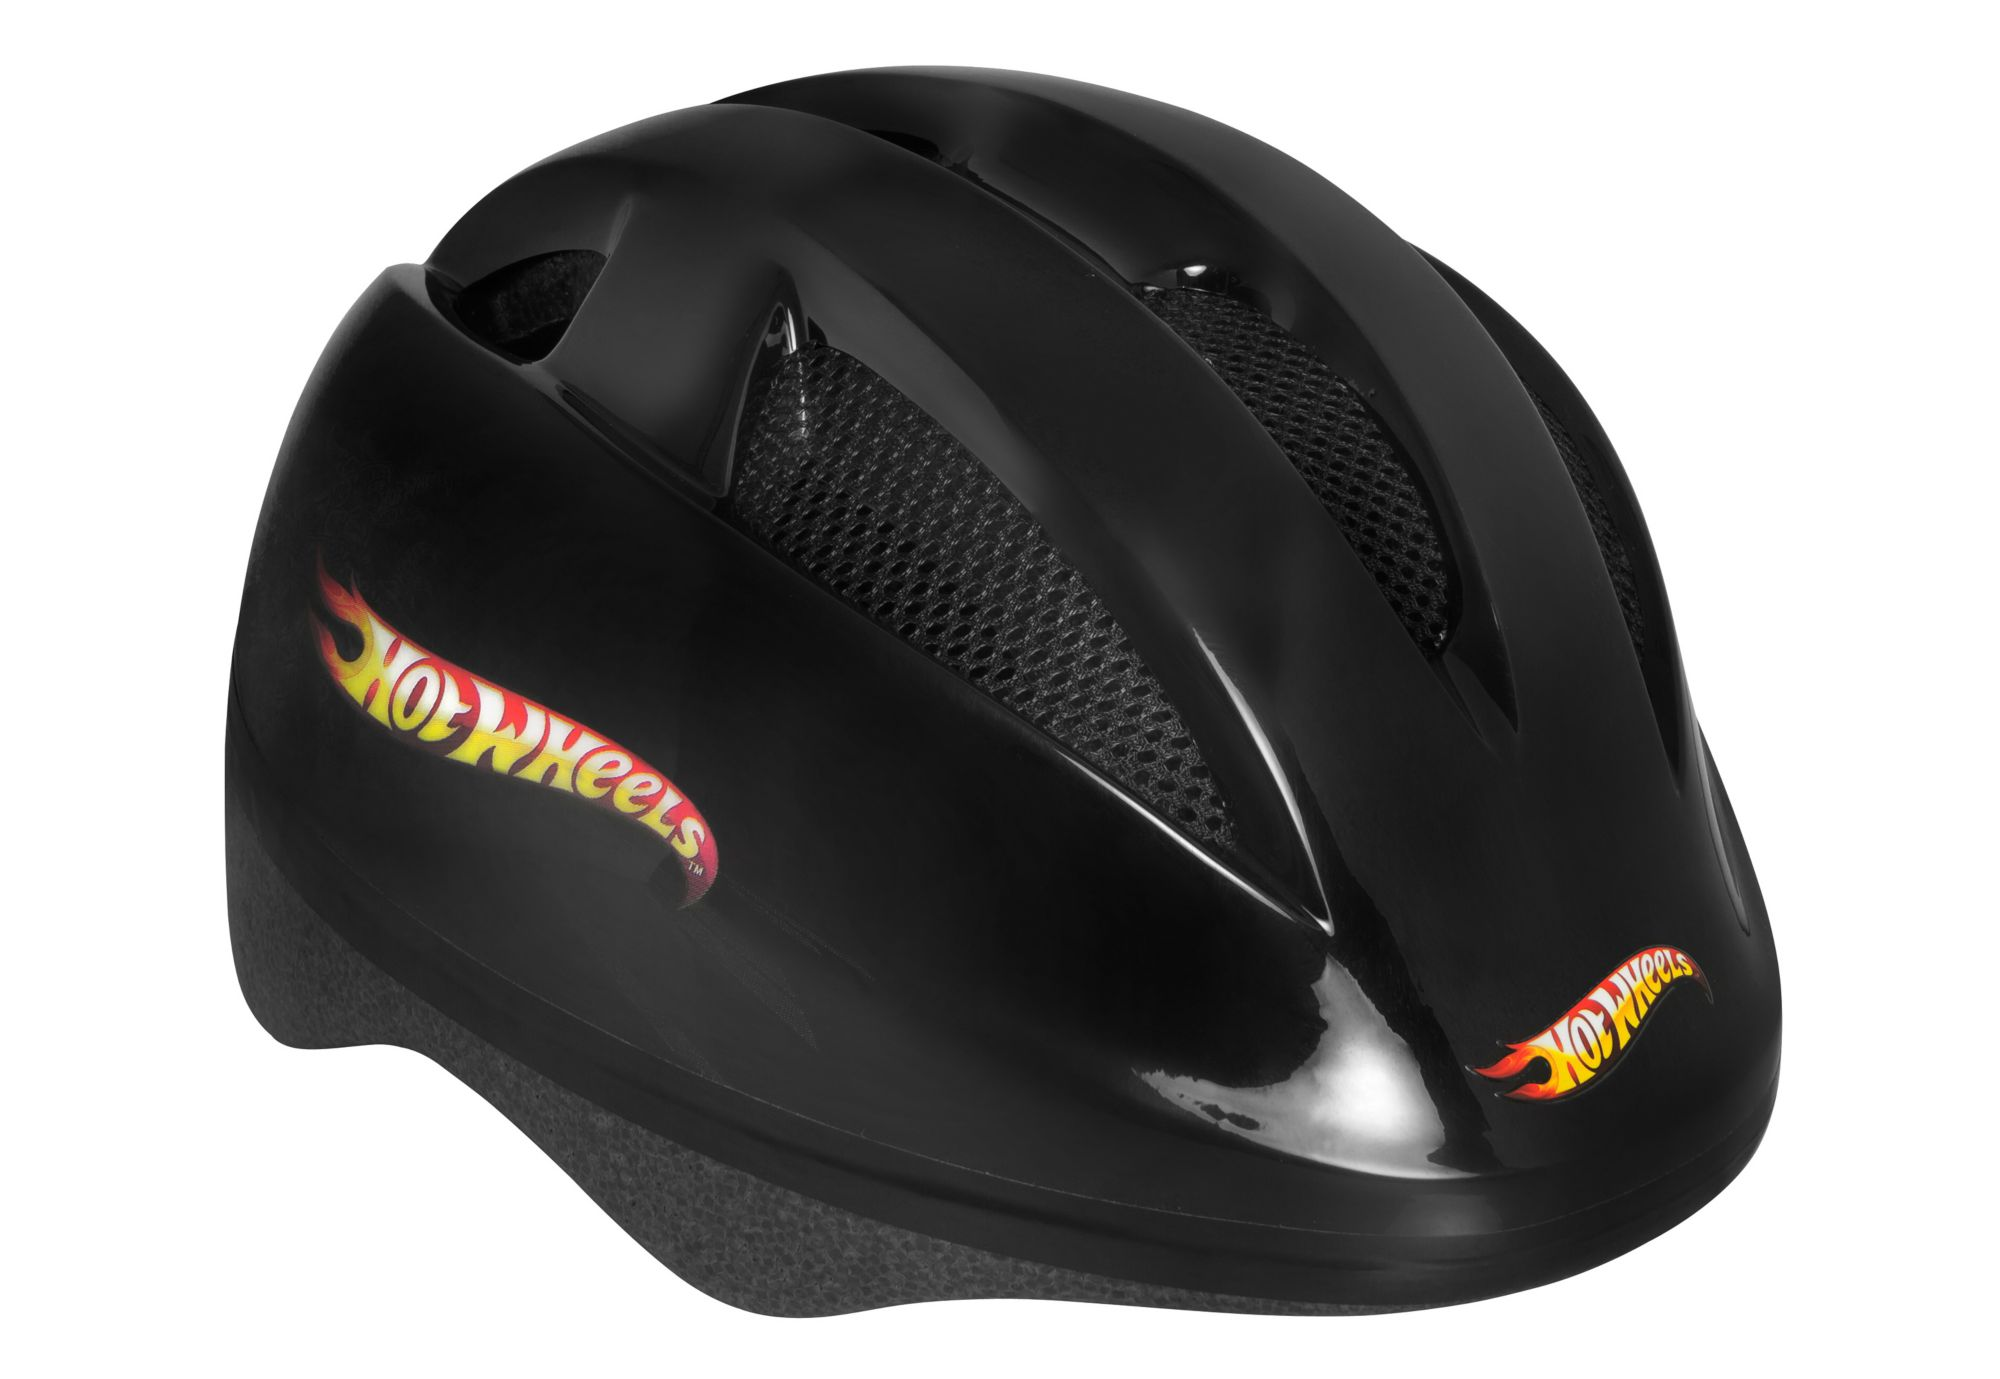 HOT WHEELS Hot Wheels Helm Kinder, »Big Logo Helmet«